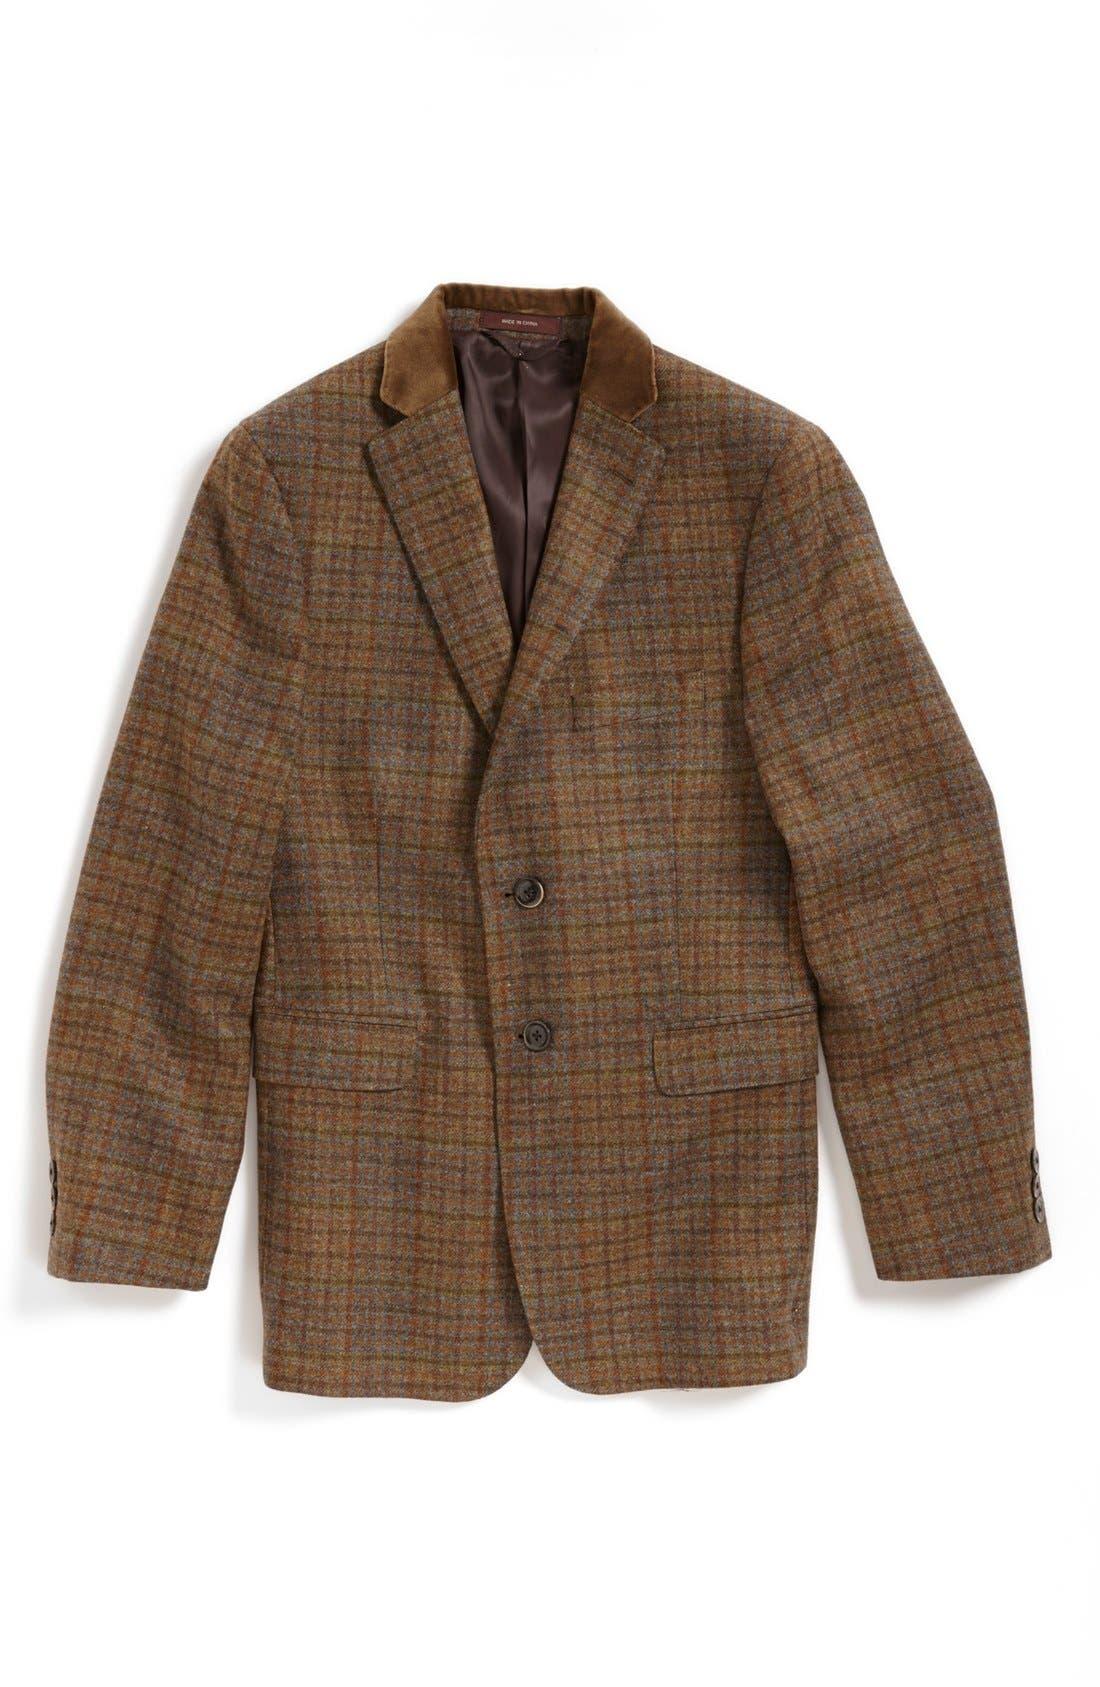 Alternate Image 1 Selected - Hickey Freeman Wool Sport Coat (Big Boys)